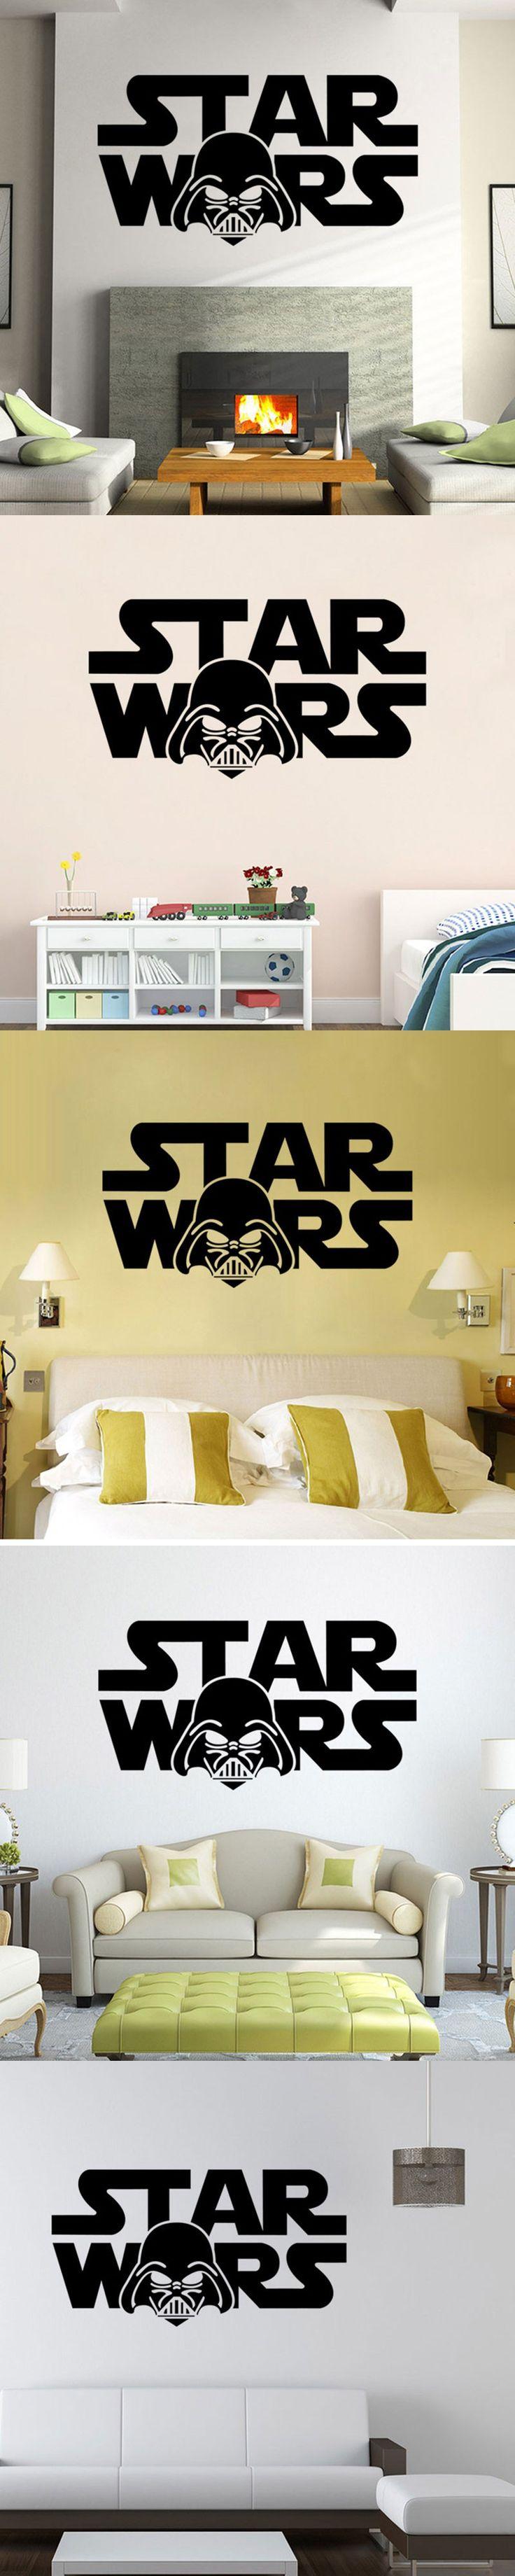 Best 20 Jedi Wallpaper Ideas On Pinterest Papier Peint Star